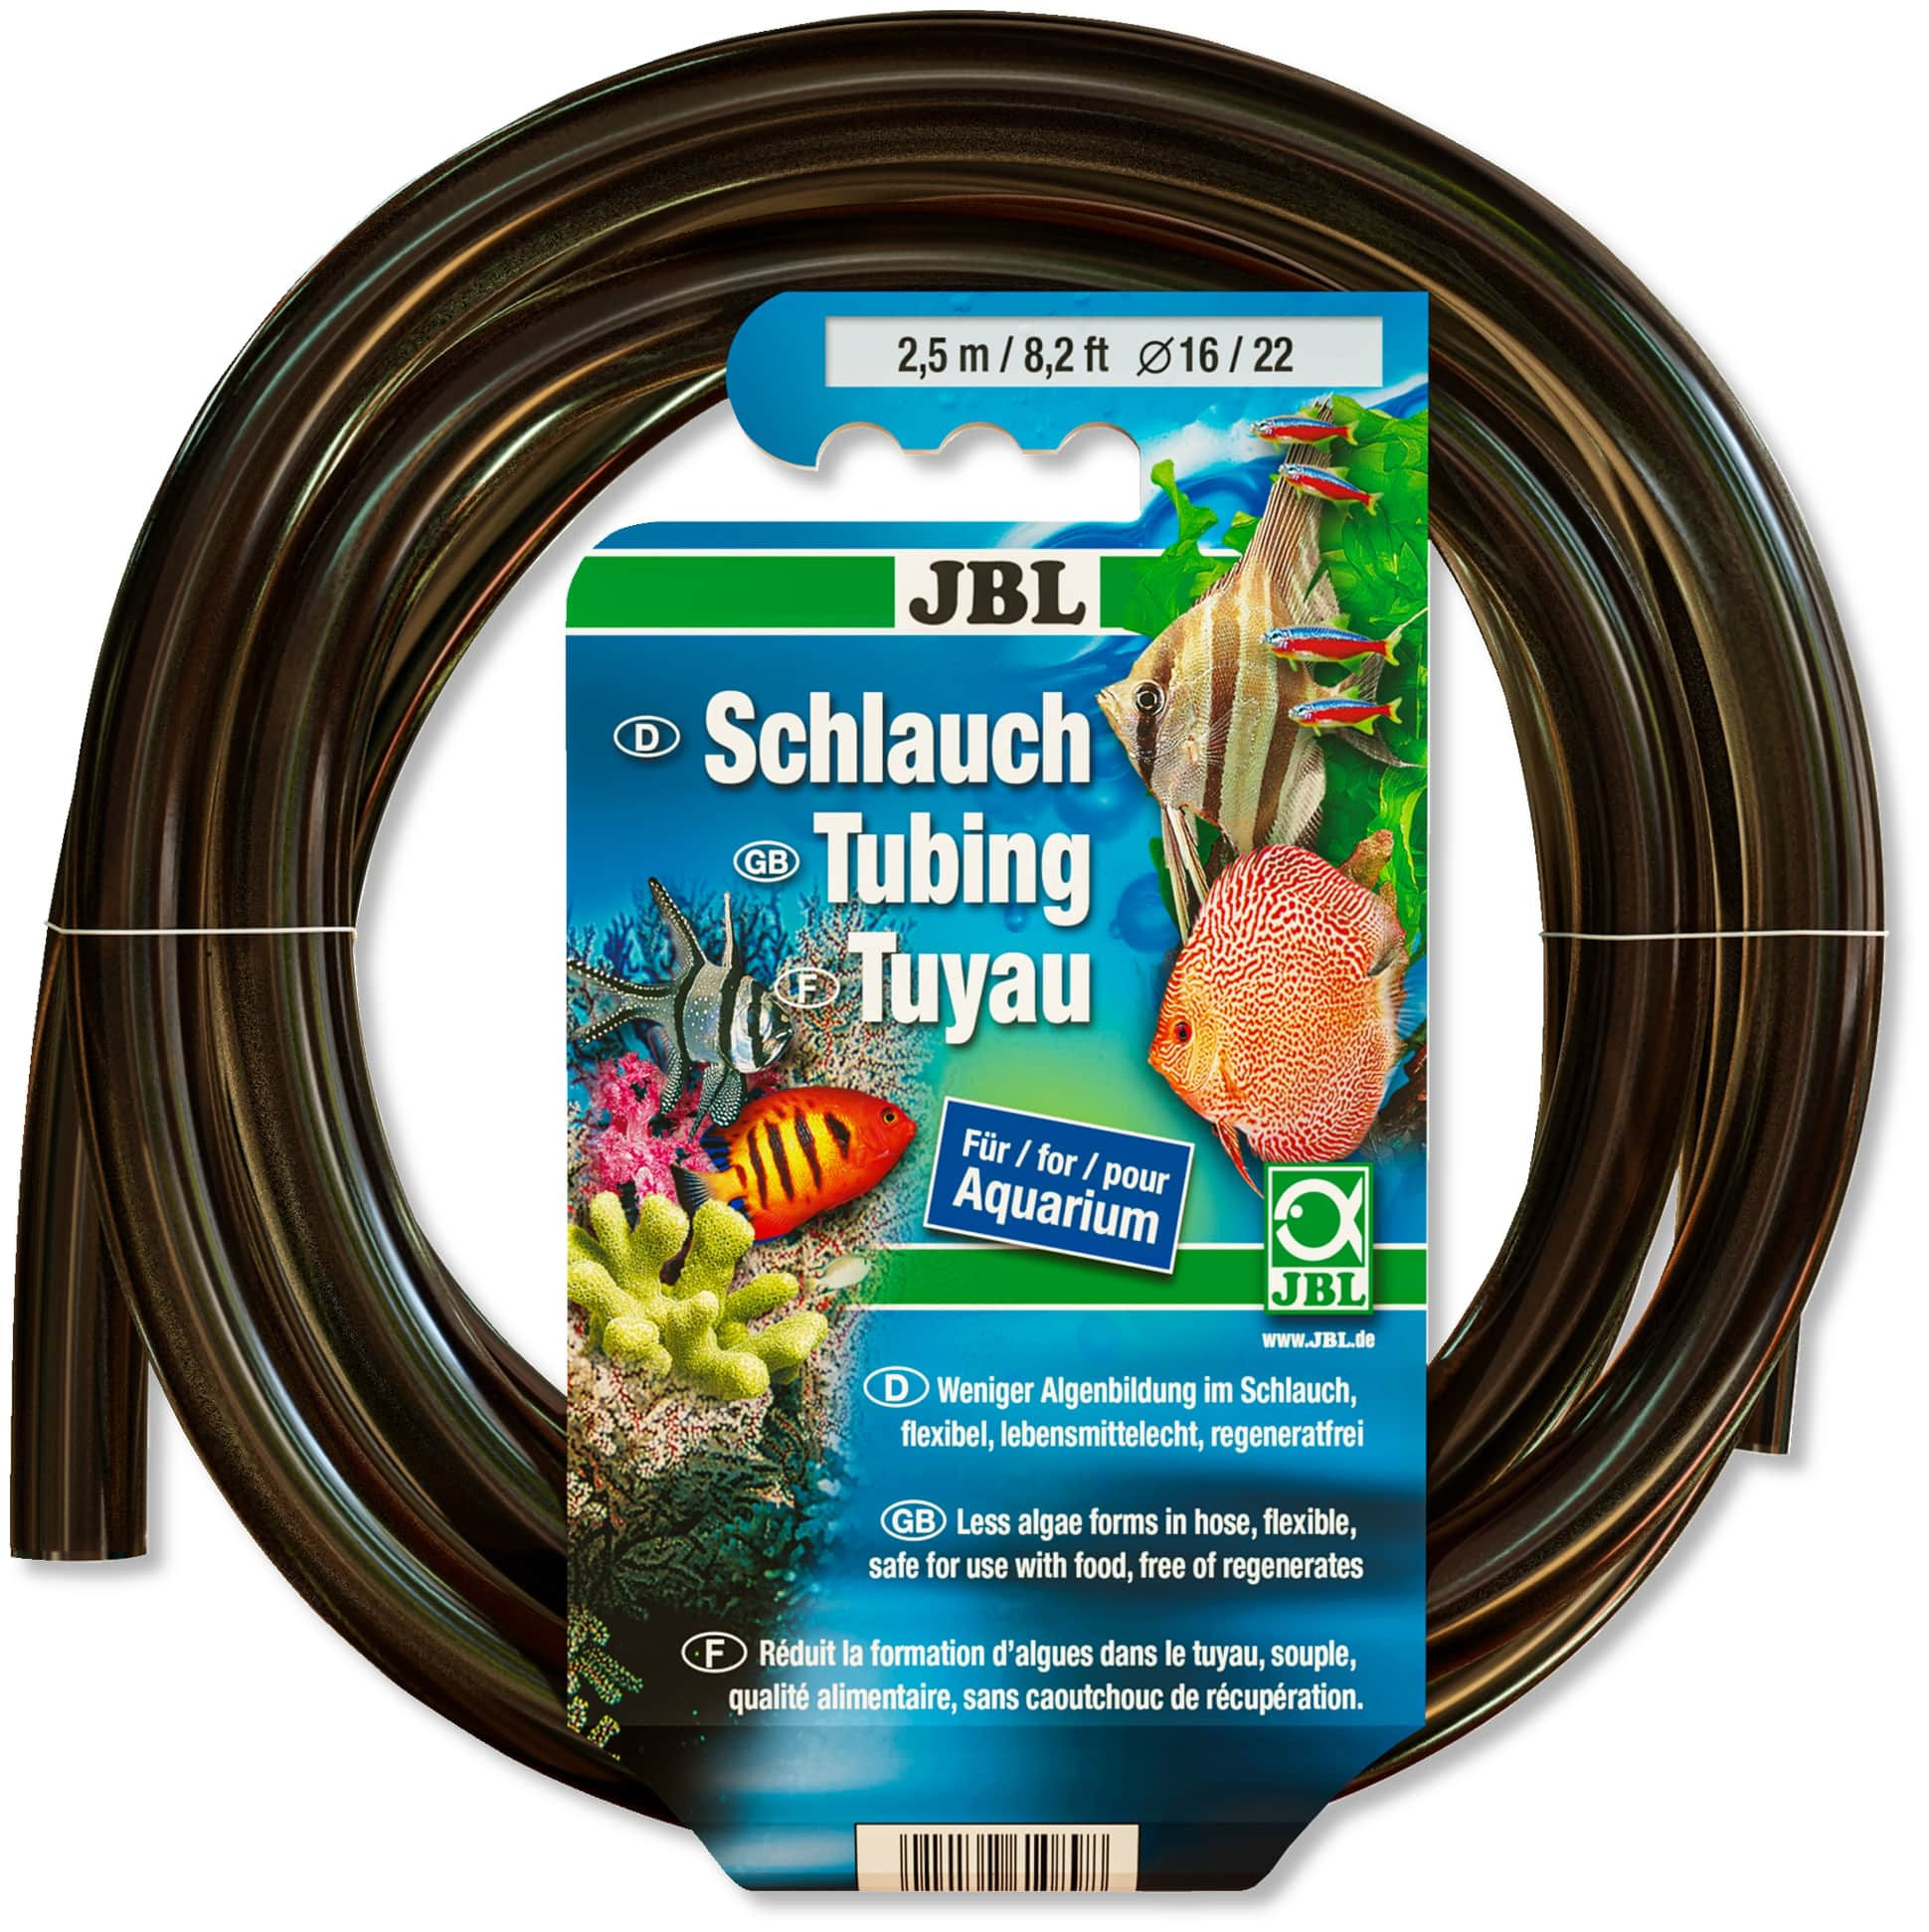 JBL Tuyau gris-transparent 16/22 2,5m anti-algues